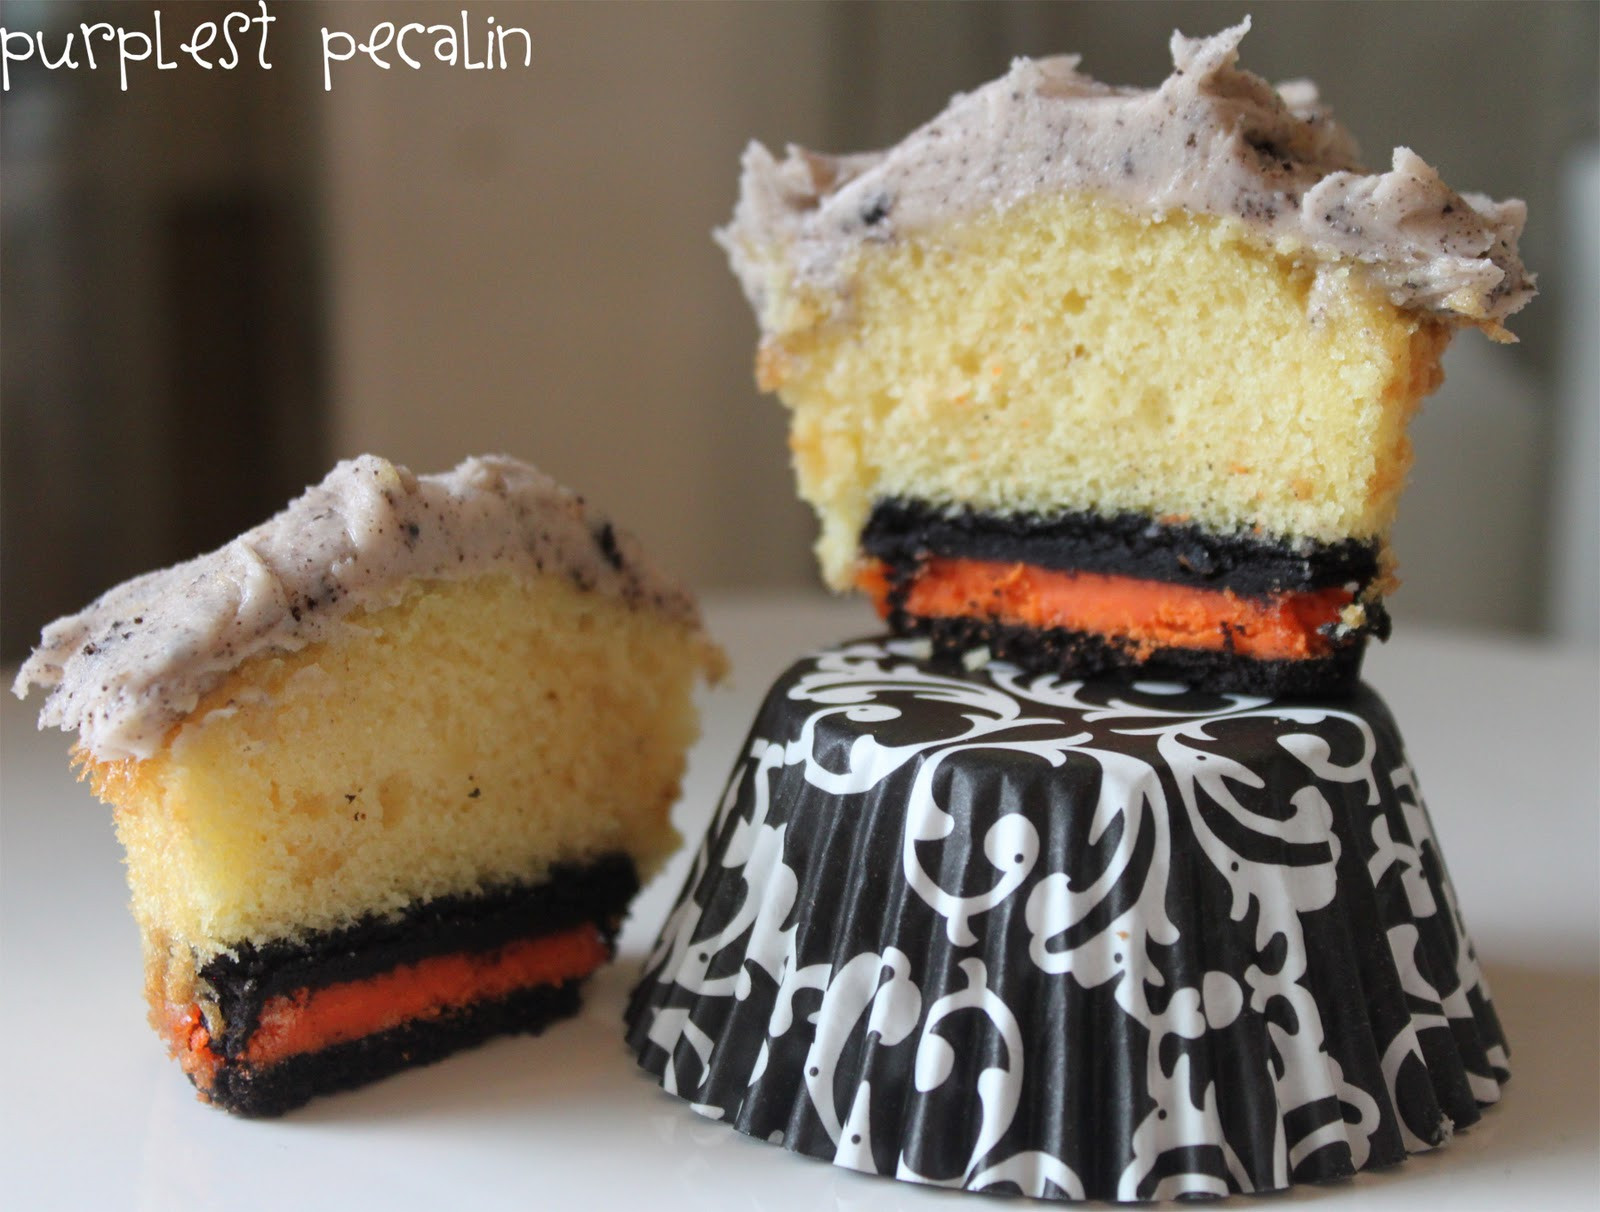 Halloween Cookies And Cupcakes  Purplest Pecalin Cookies & Cream Cupcakes Halloweenified